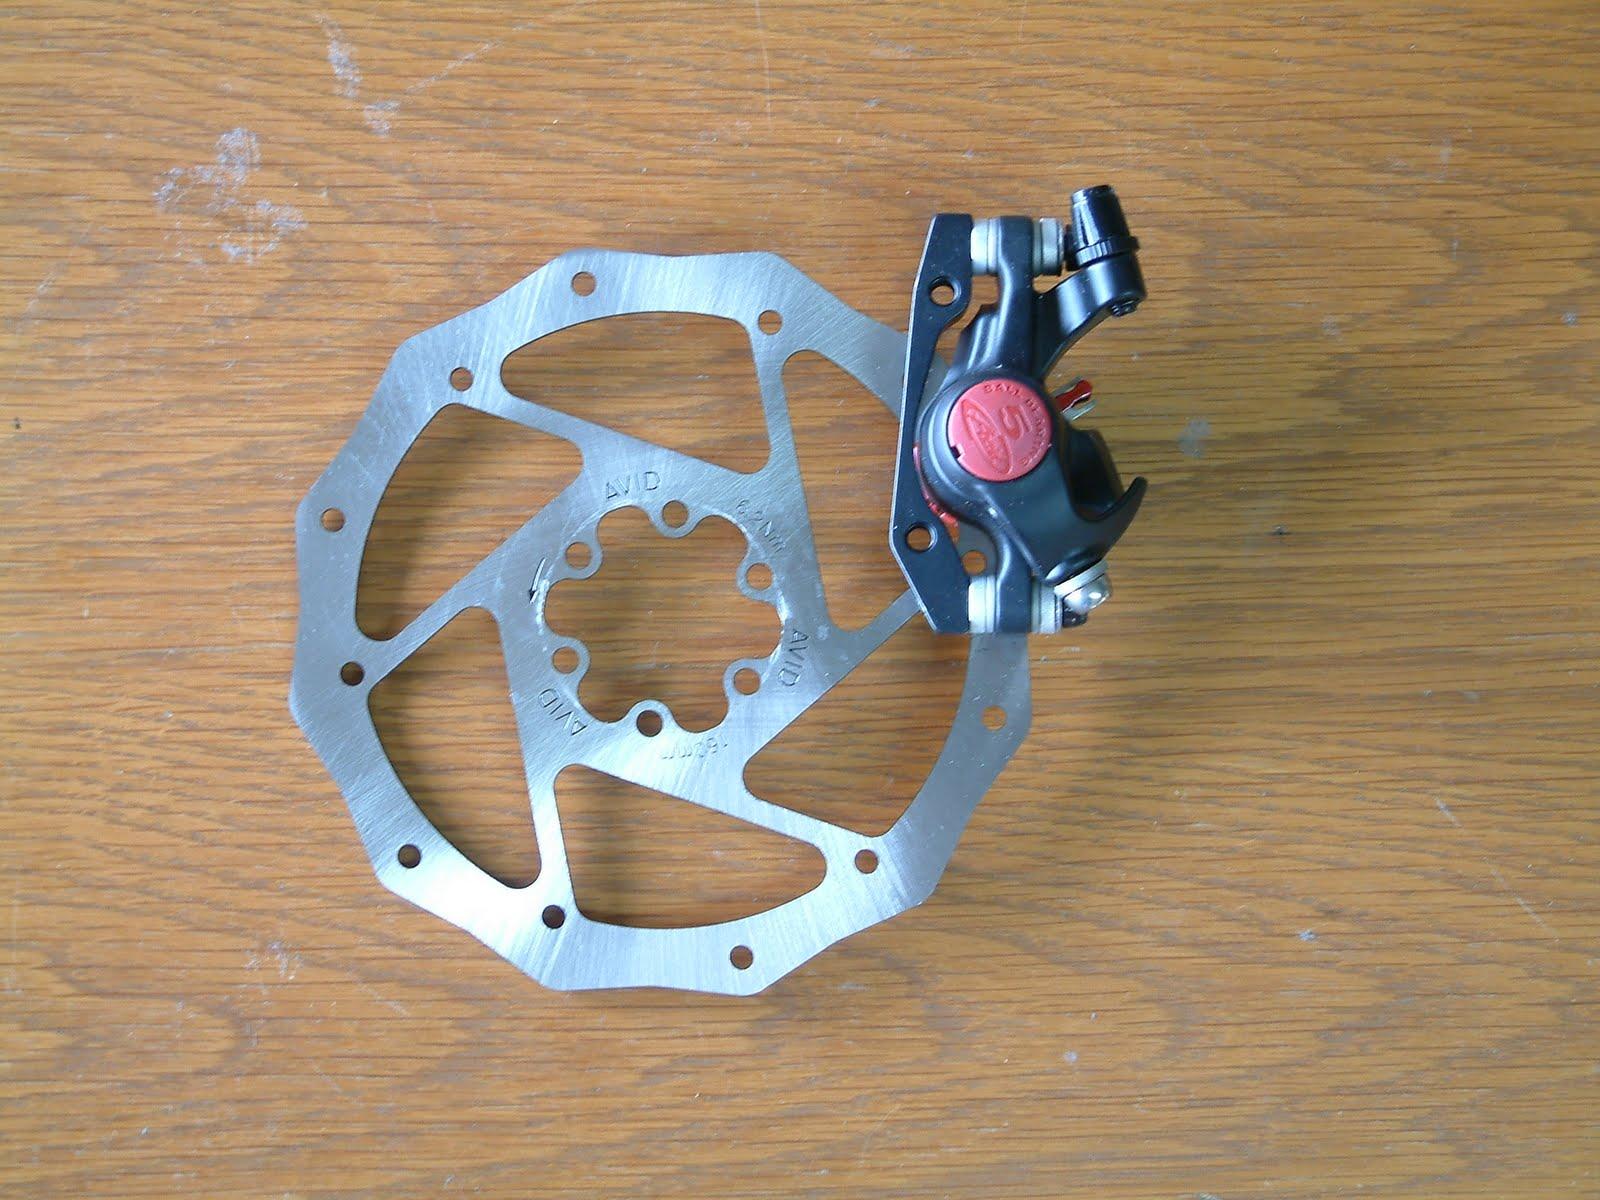 Belite Ultralight Blog: Wichita Machinists, Disc Brakes, and